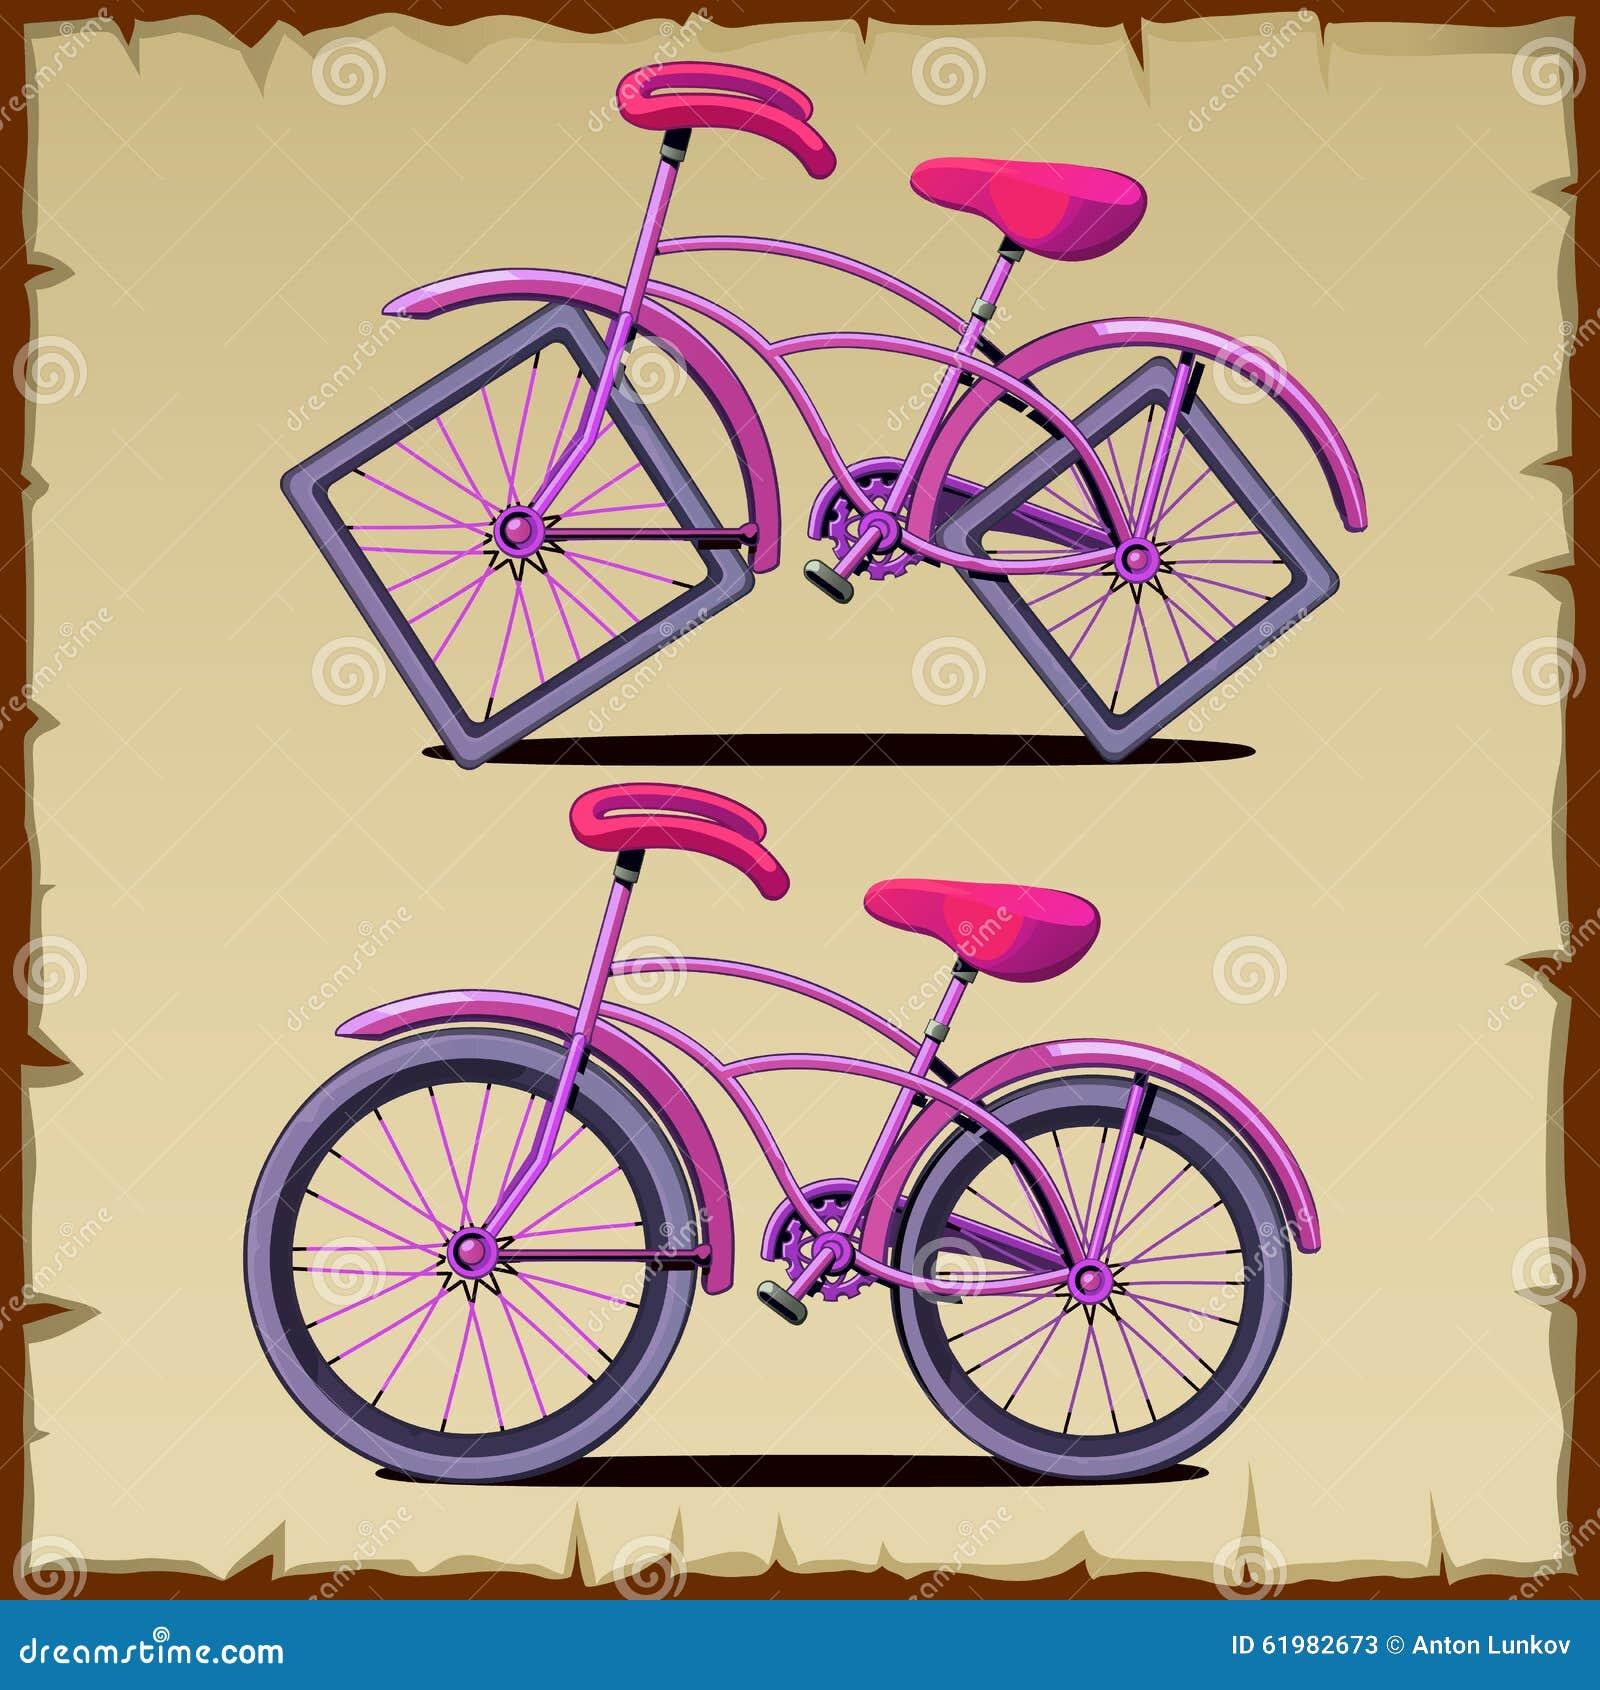 Square Wheels Bike. Cartoon Vector